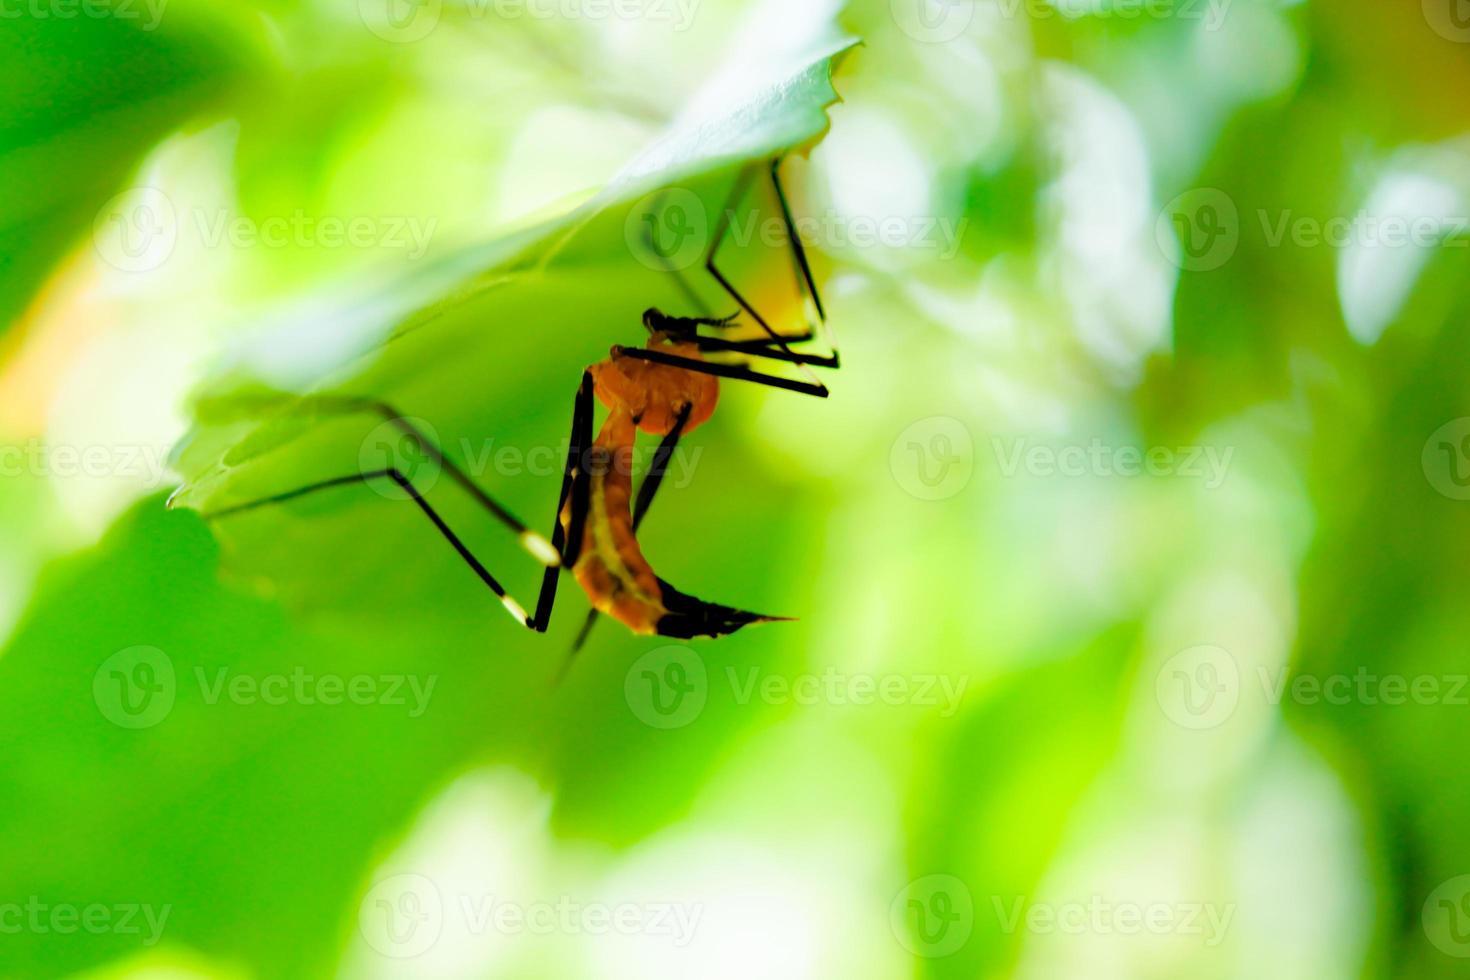 Malariamücke unter grünem Blatt foto